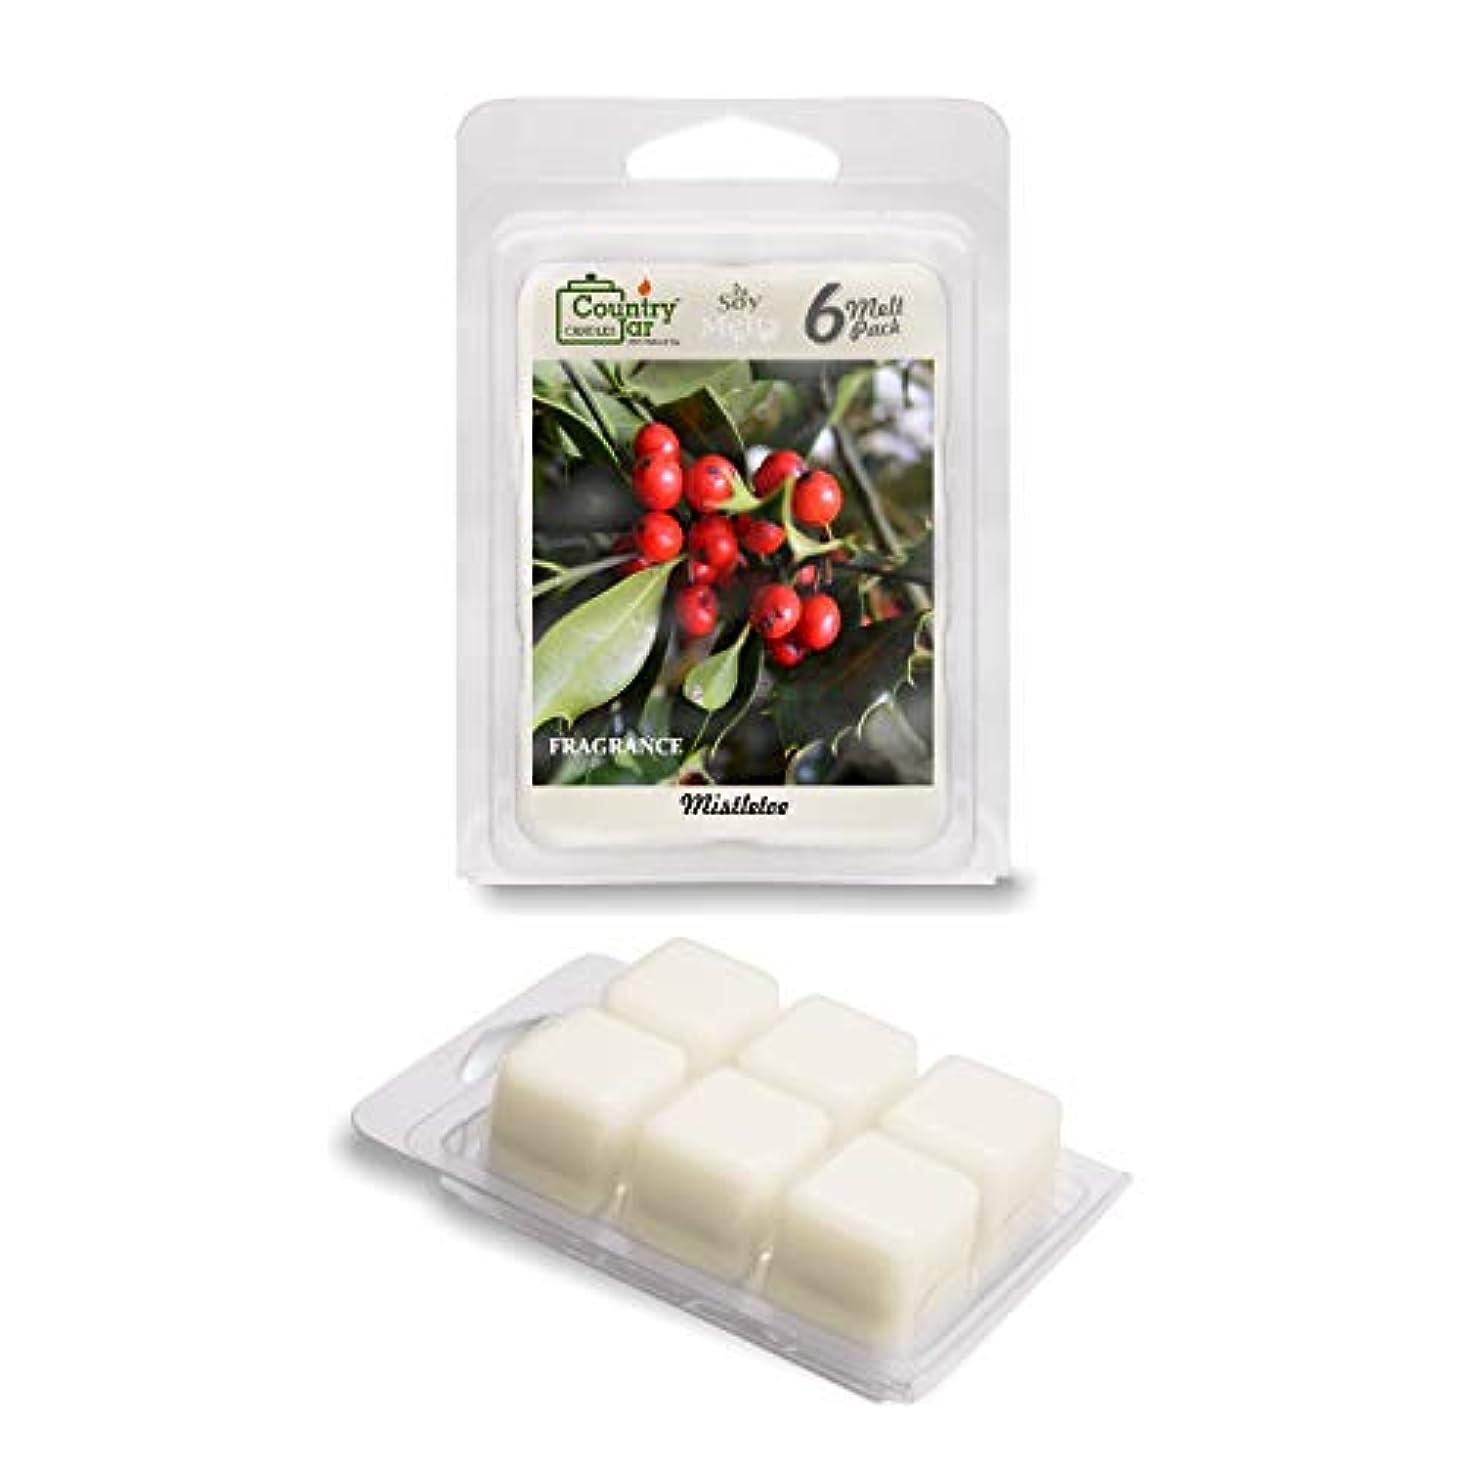 Nature 's Best大豆キャンドルby国Jar Candle Co。 Wax Melts (WM) MDL-SM103